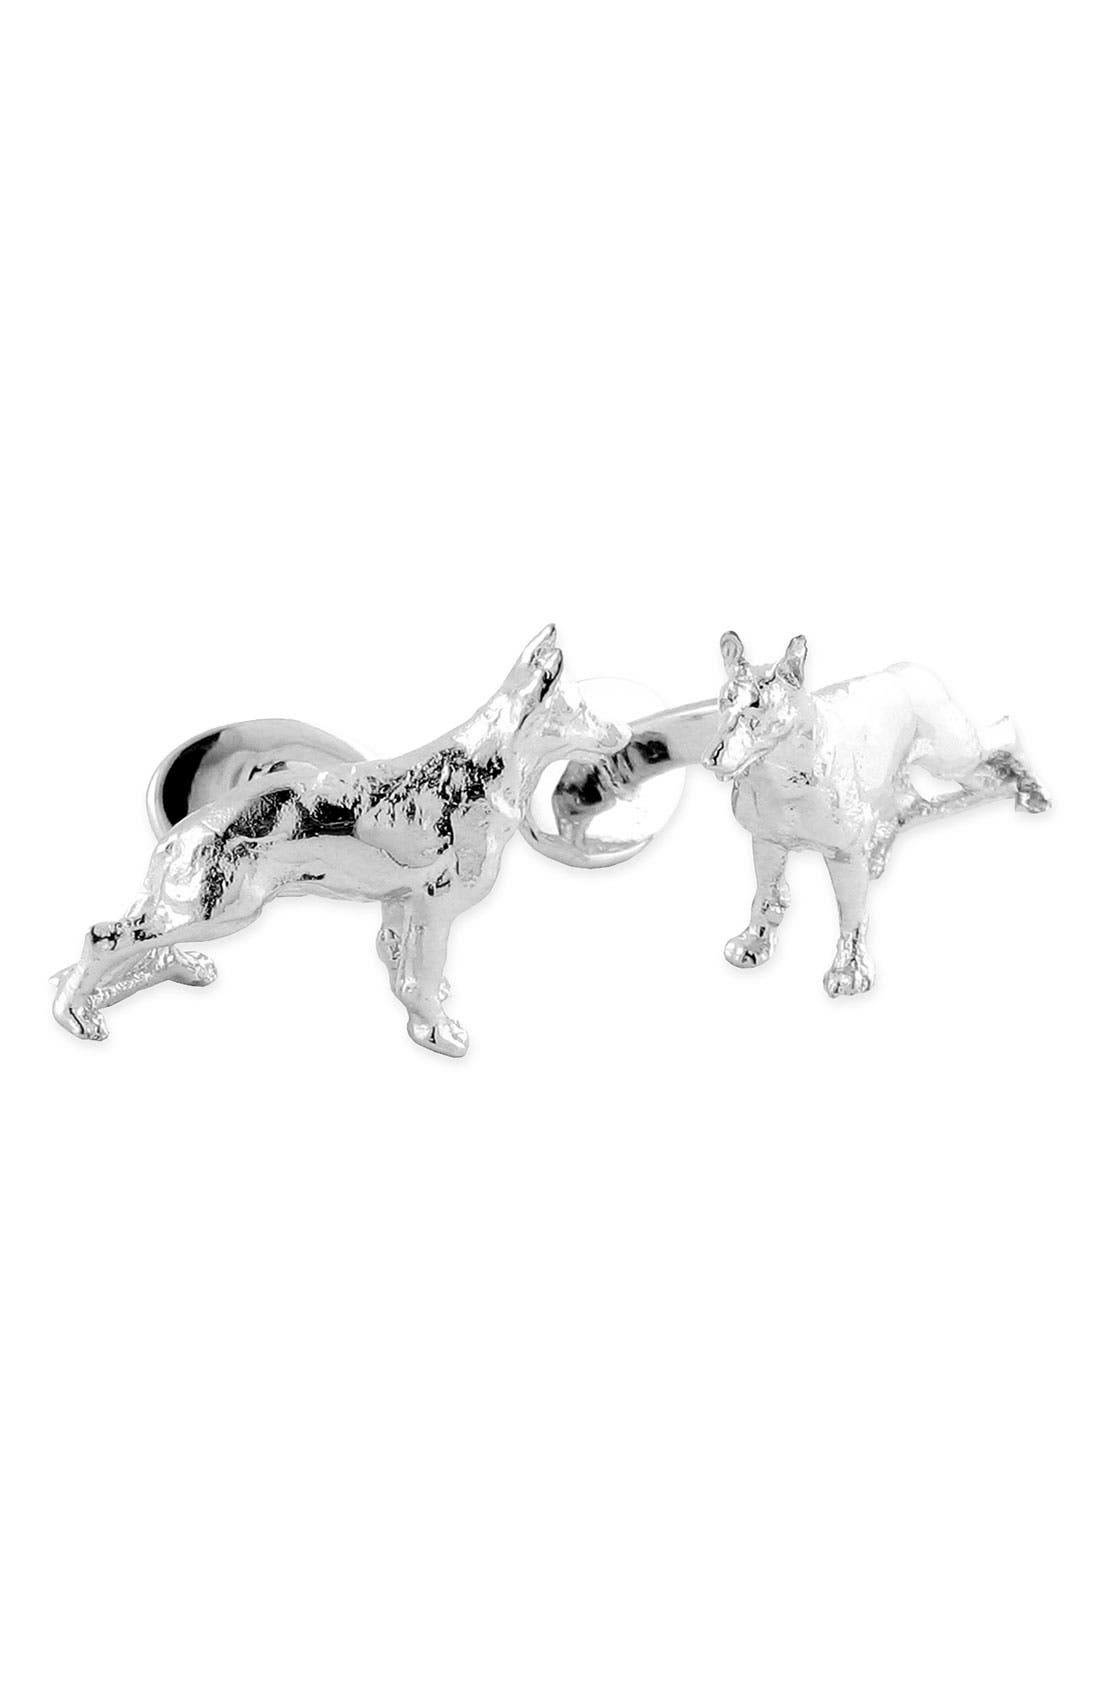 Alternate Image 1 Selected - David Donahue 'German Shepherd' Sterling Silver Cuff Links